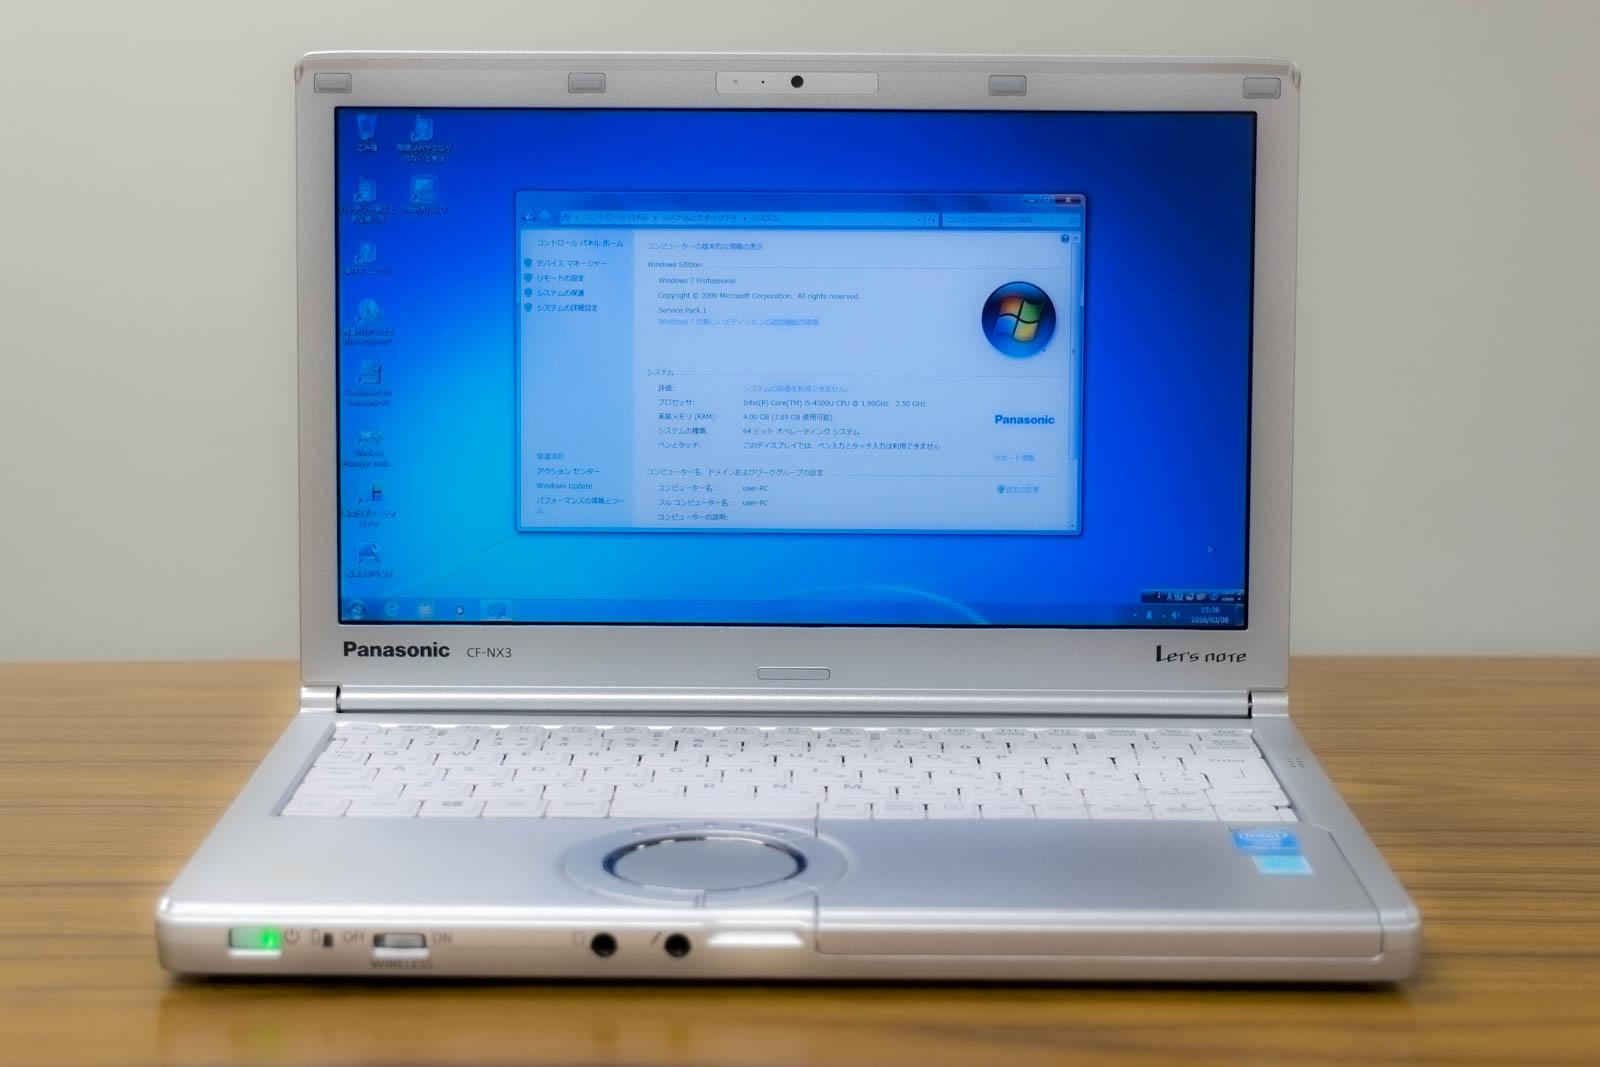 Panasonic レッツノート CF-NX3EDHTS B5ノートパソコン, Windows 7 Professional 64bit, Core i5-4300U, メモリ4GB(4GBx1), 320GB HDD, 累積使用時間:4260時間【中古】